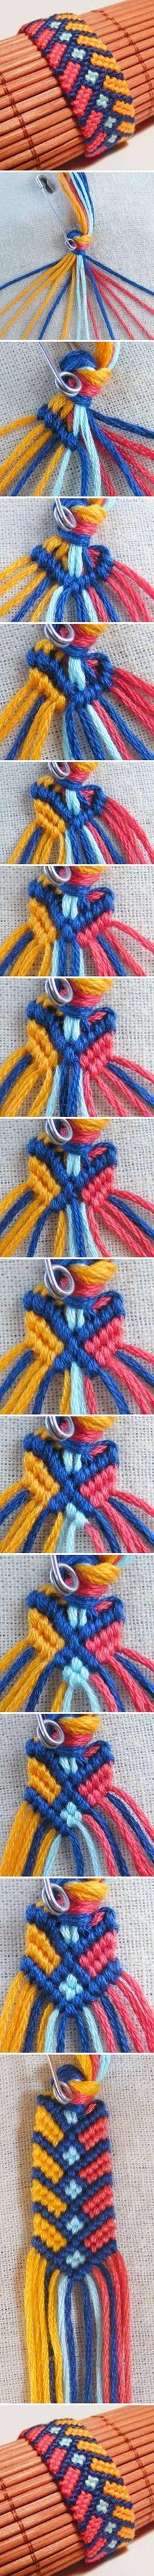 DIY Stylish Square Knot Macrame Bracelet #DIY #fashion #bracelet #Macrame